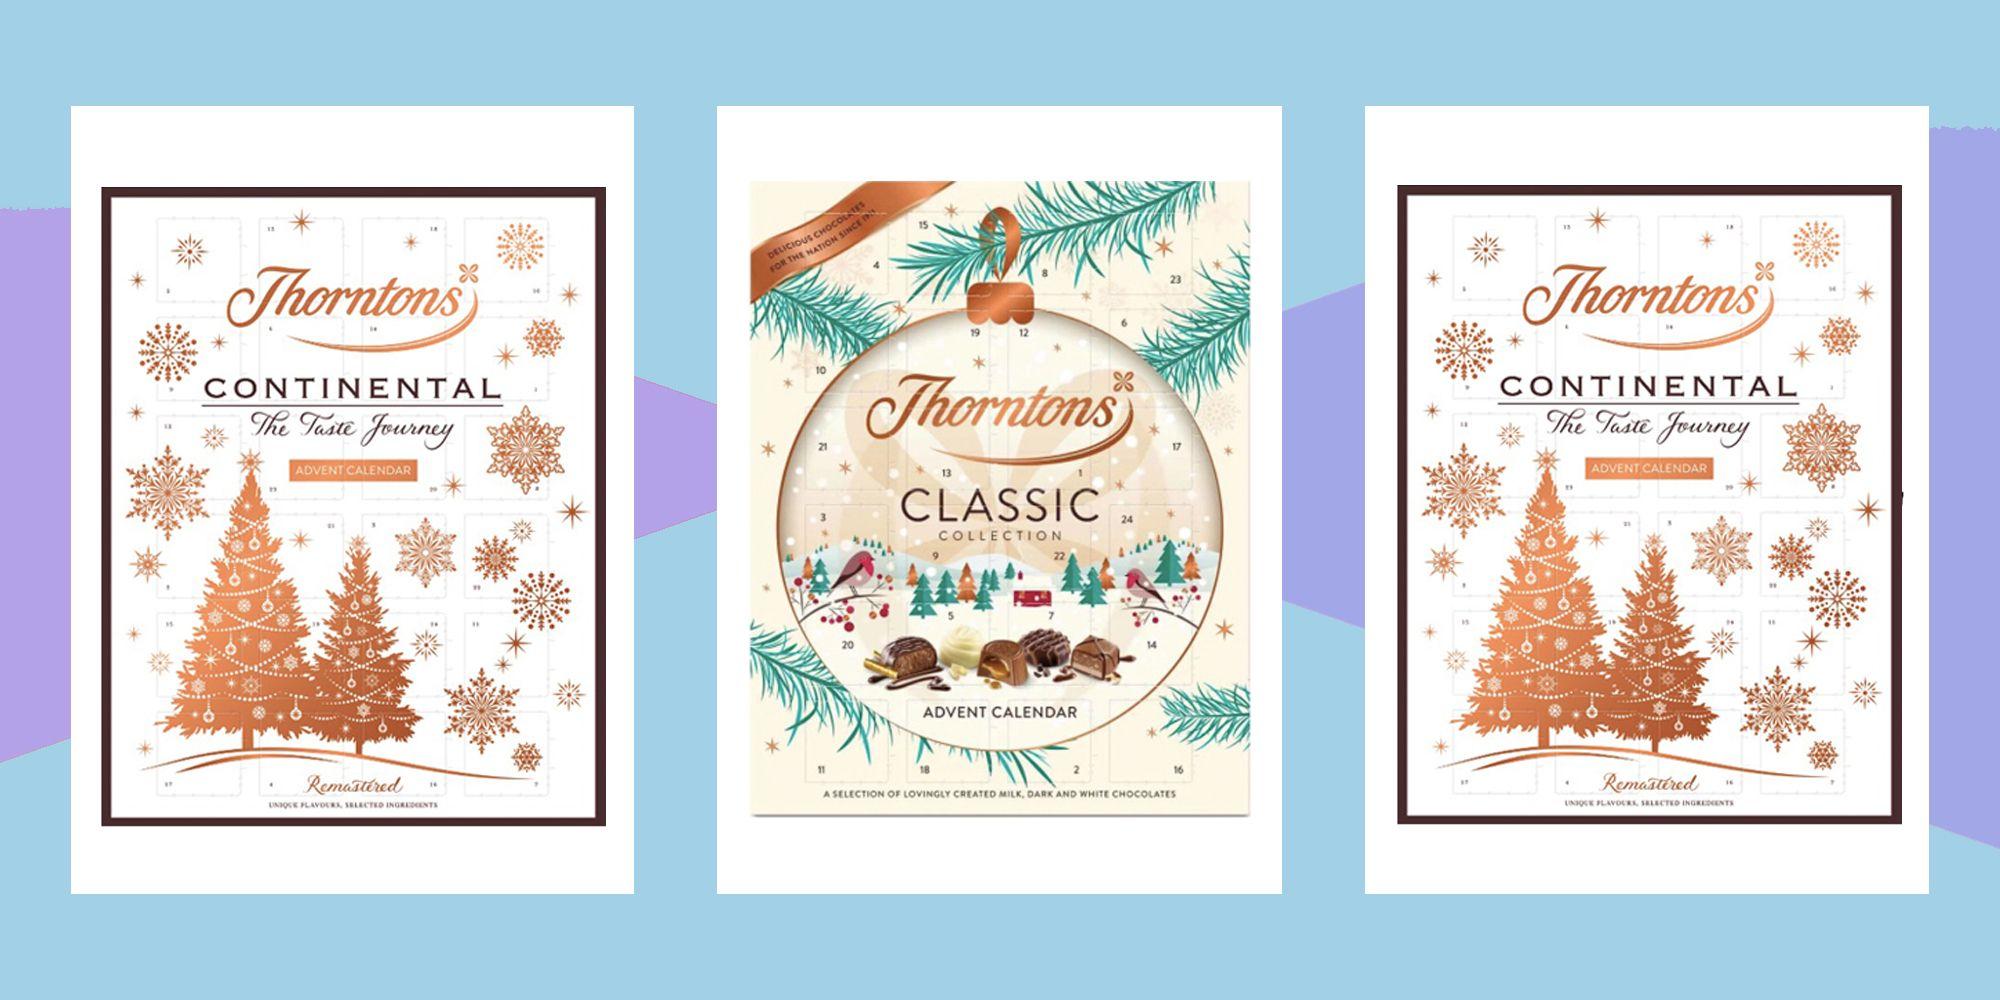 Best chocolate advent calendars - Chocolate advent calendar 2018